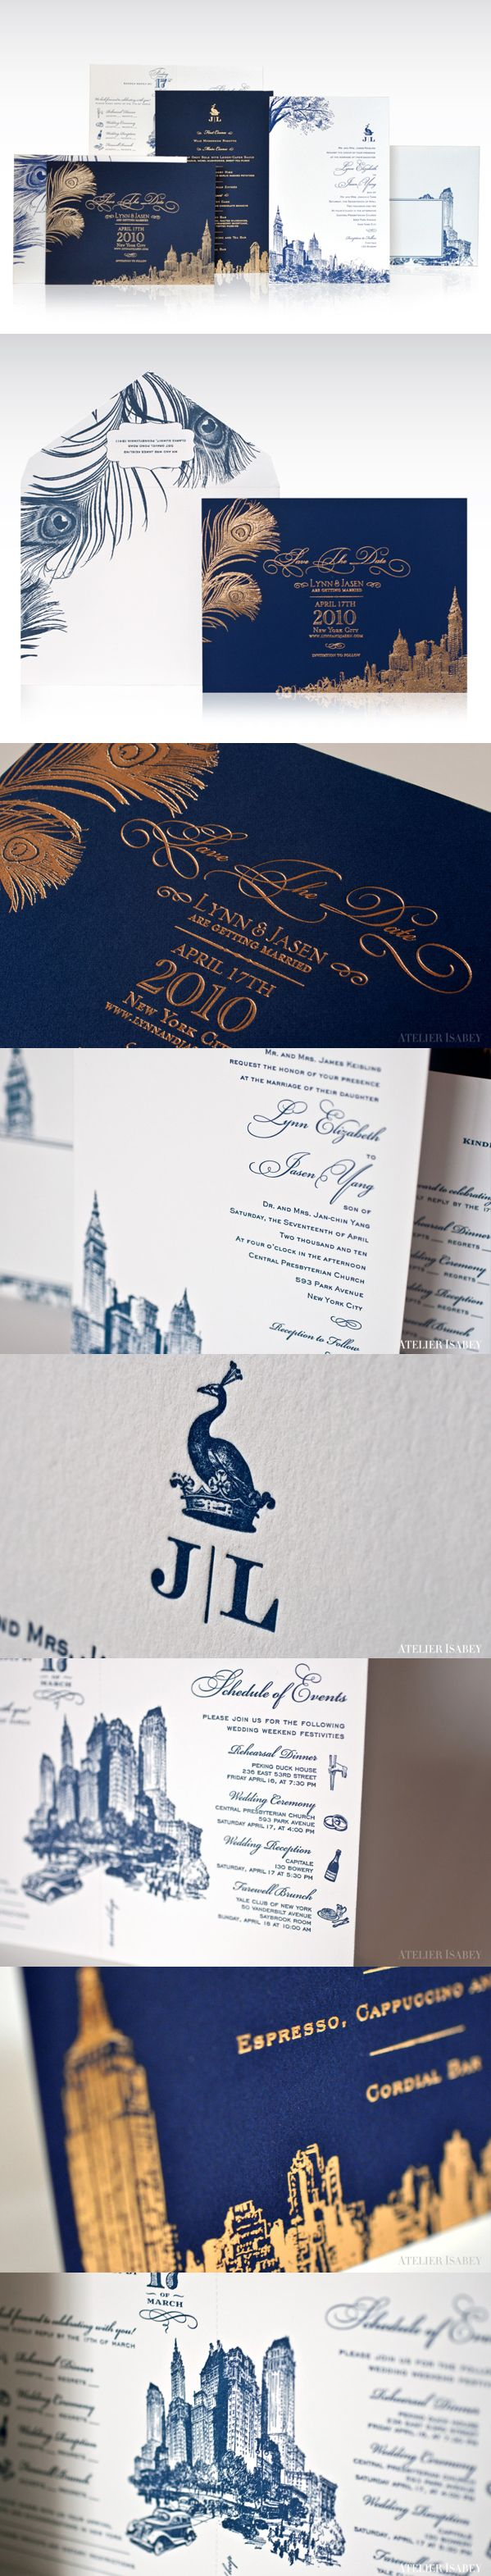 New York City Peacock Wedding Invitations http://www.behance.net/gallery/New-York-City-Peacock-Wedding-Invitations/7734733